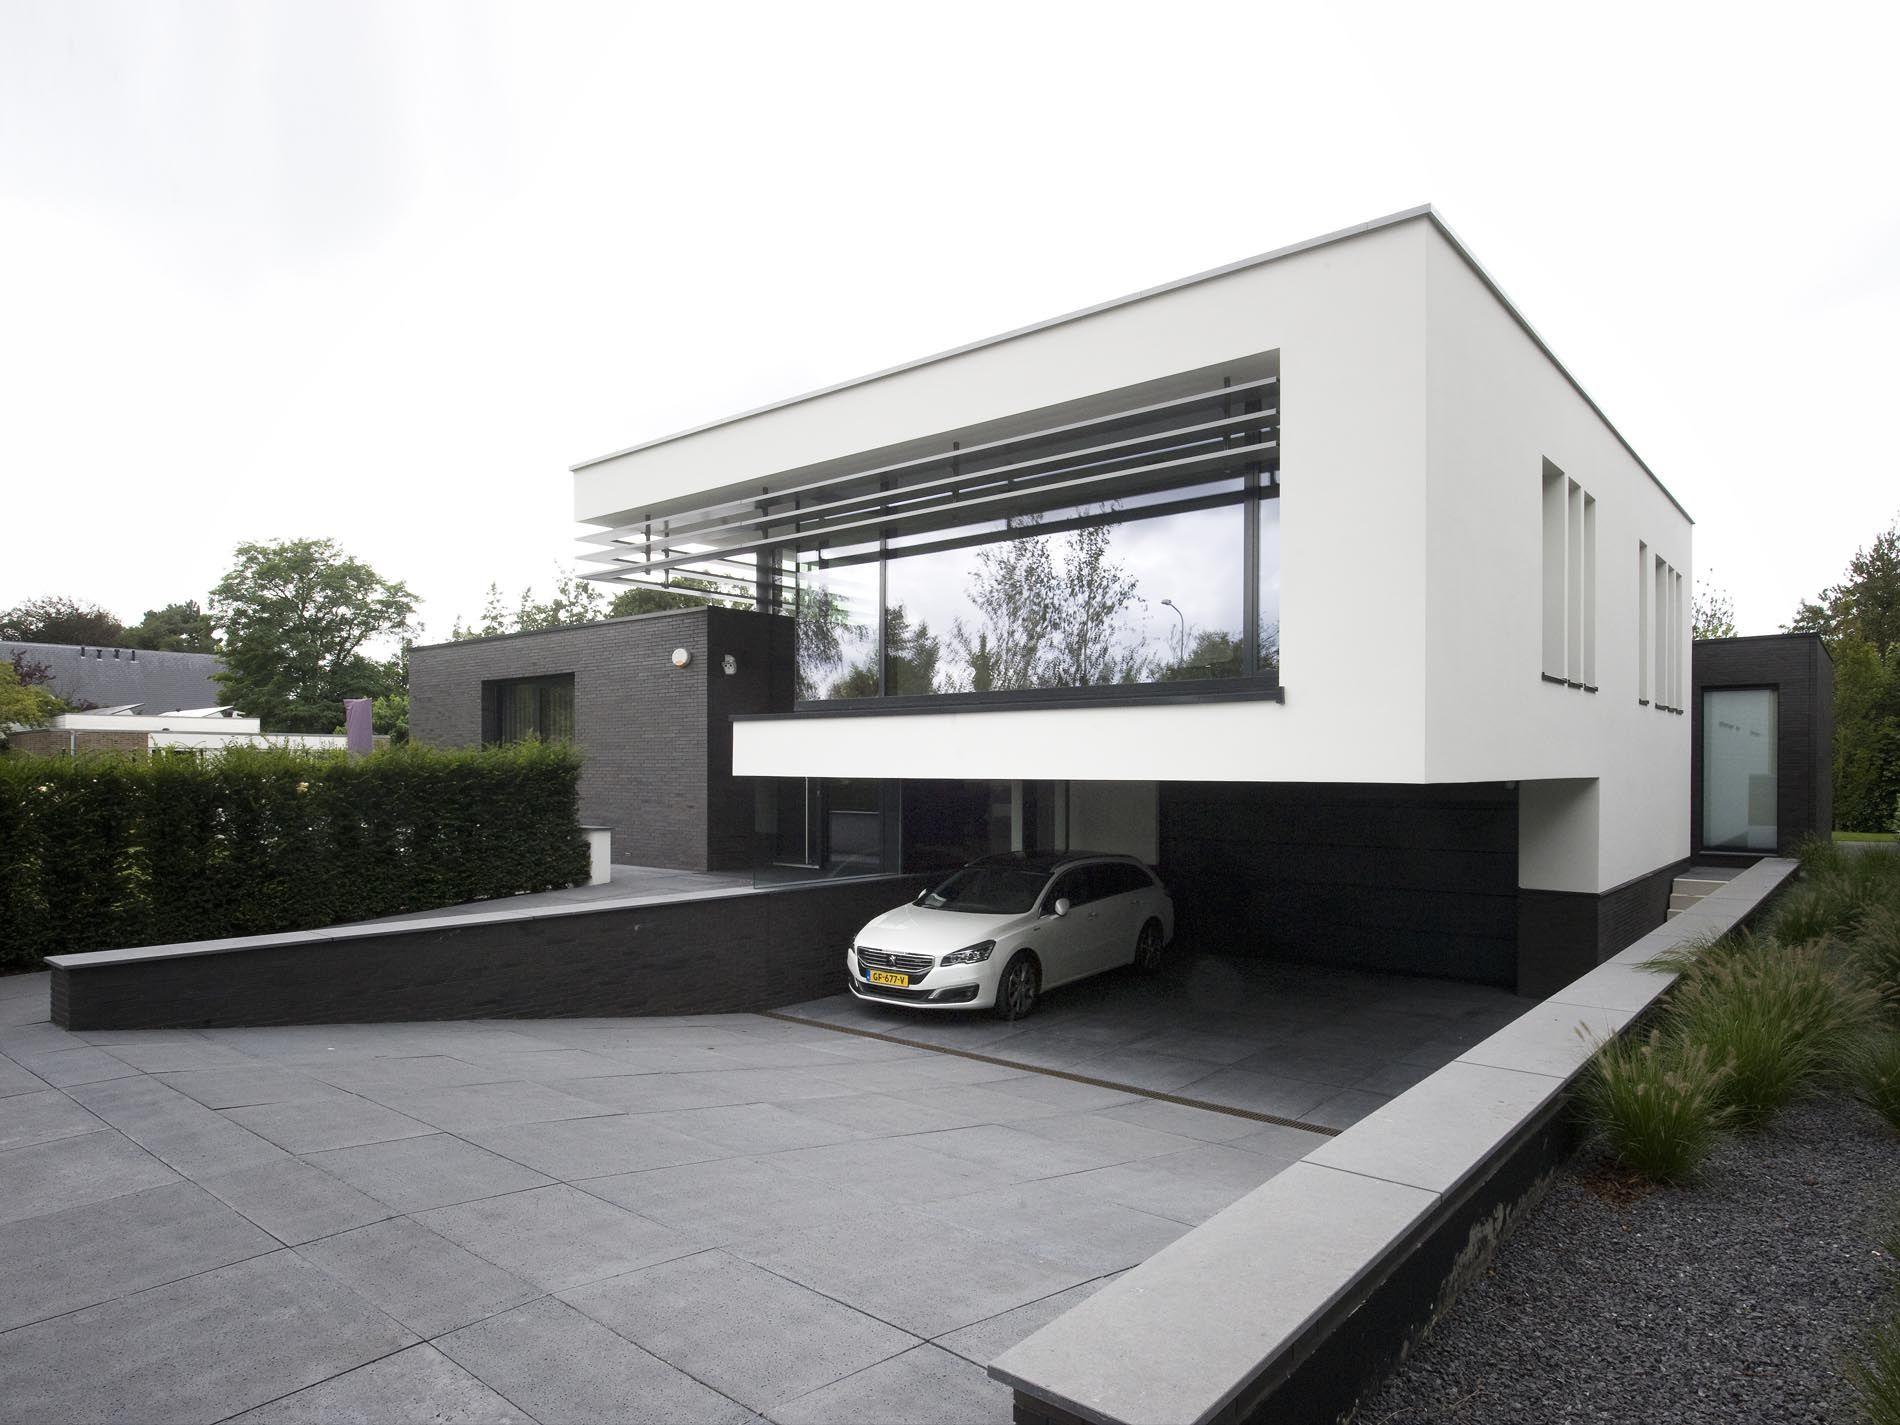 maas architecten woonhuis heemskerk modern house pinterest moderne h user. Black Bedroom Furniture Sets. Home Design Ideas